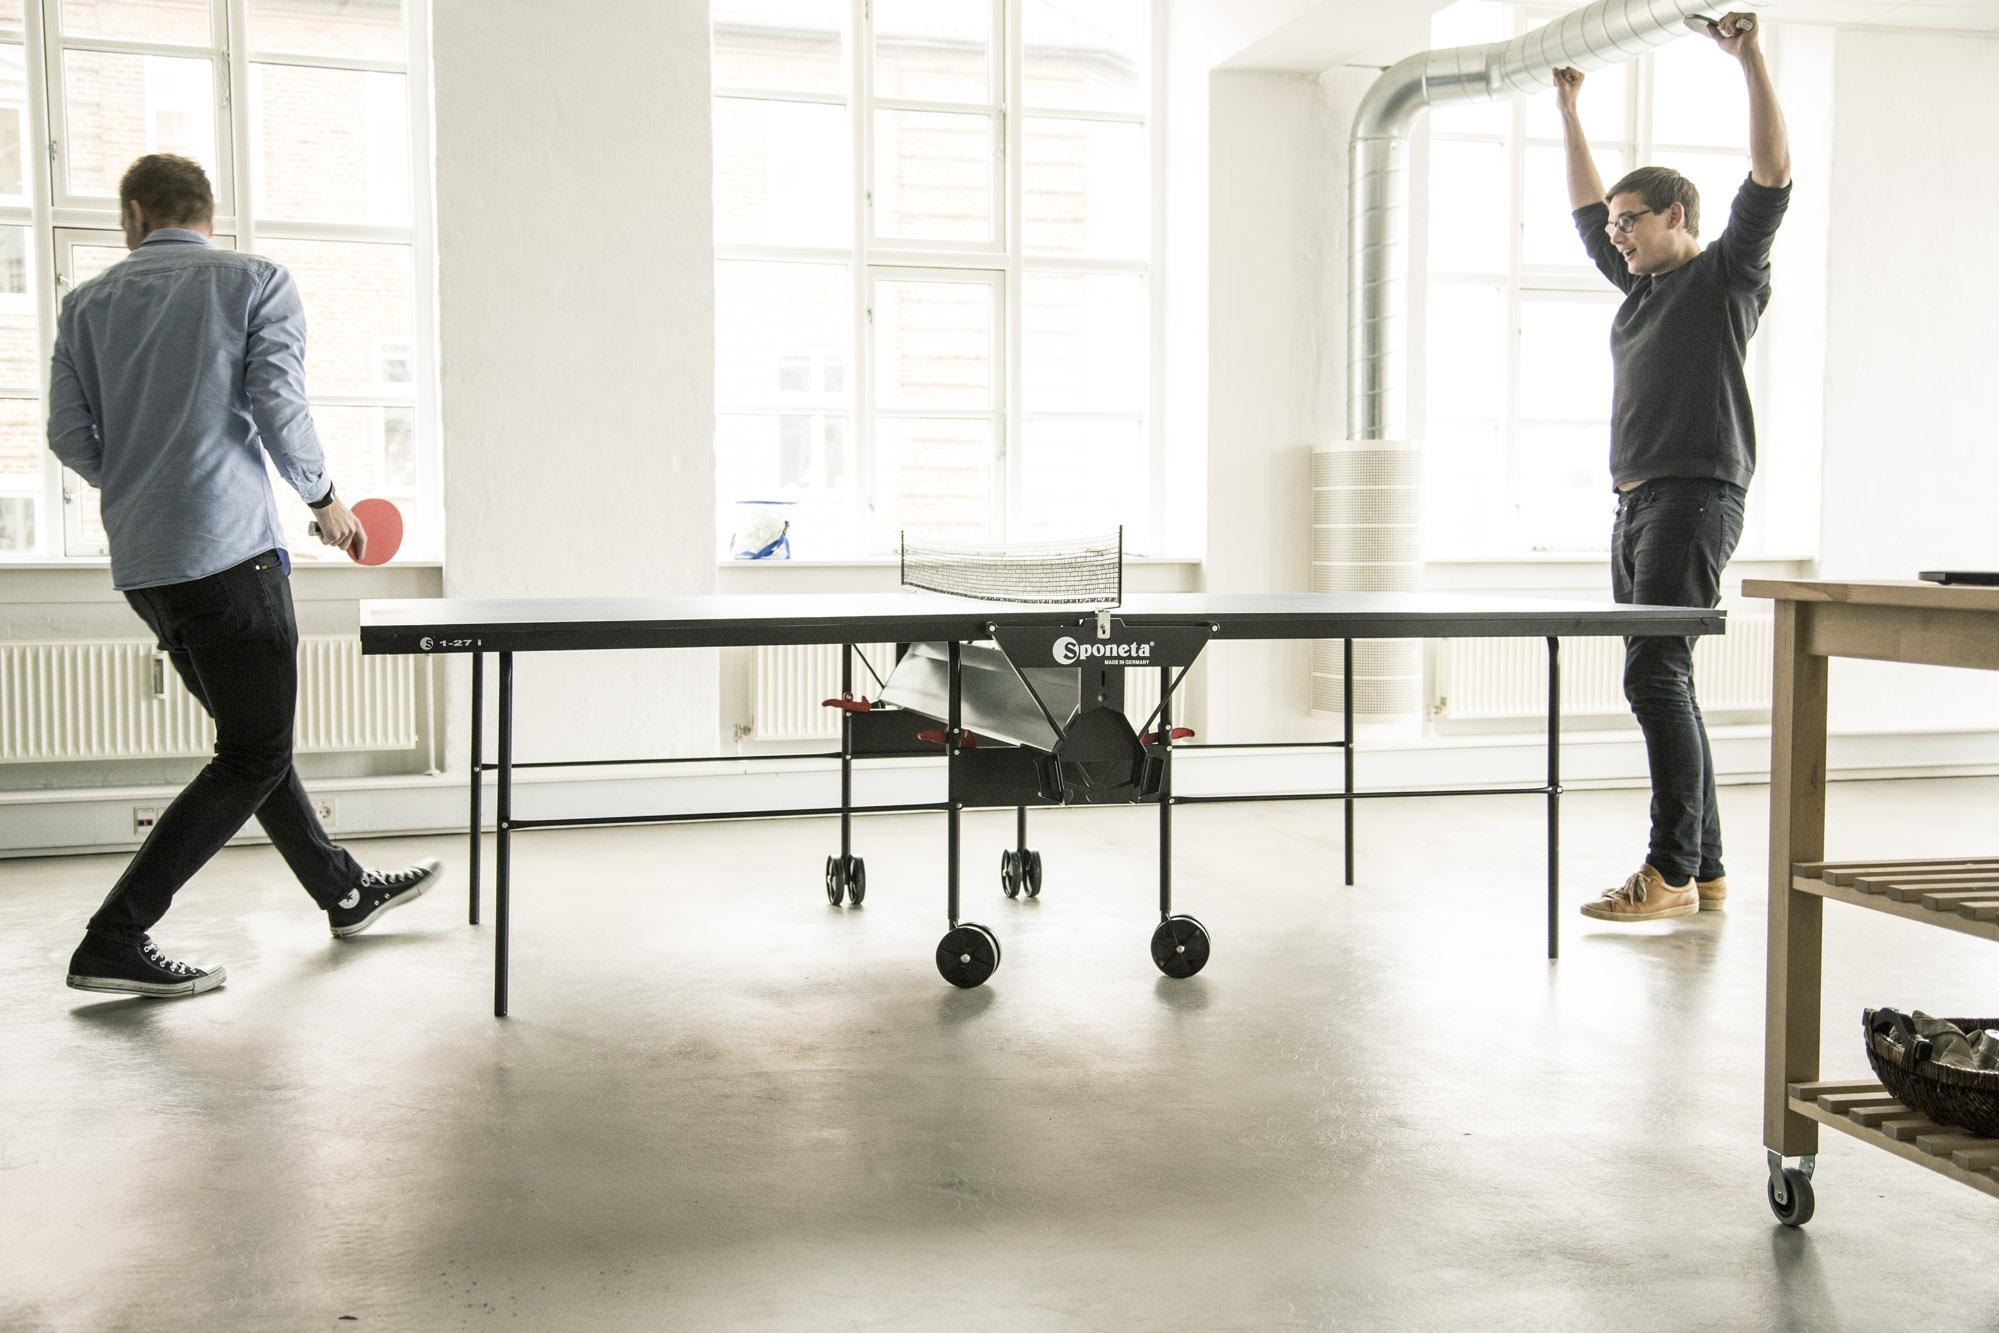 EasyPractice team members playing table tennis